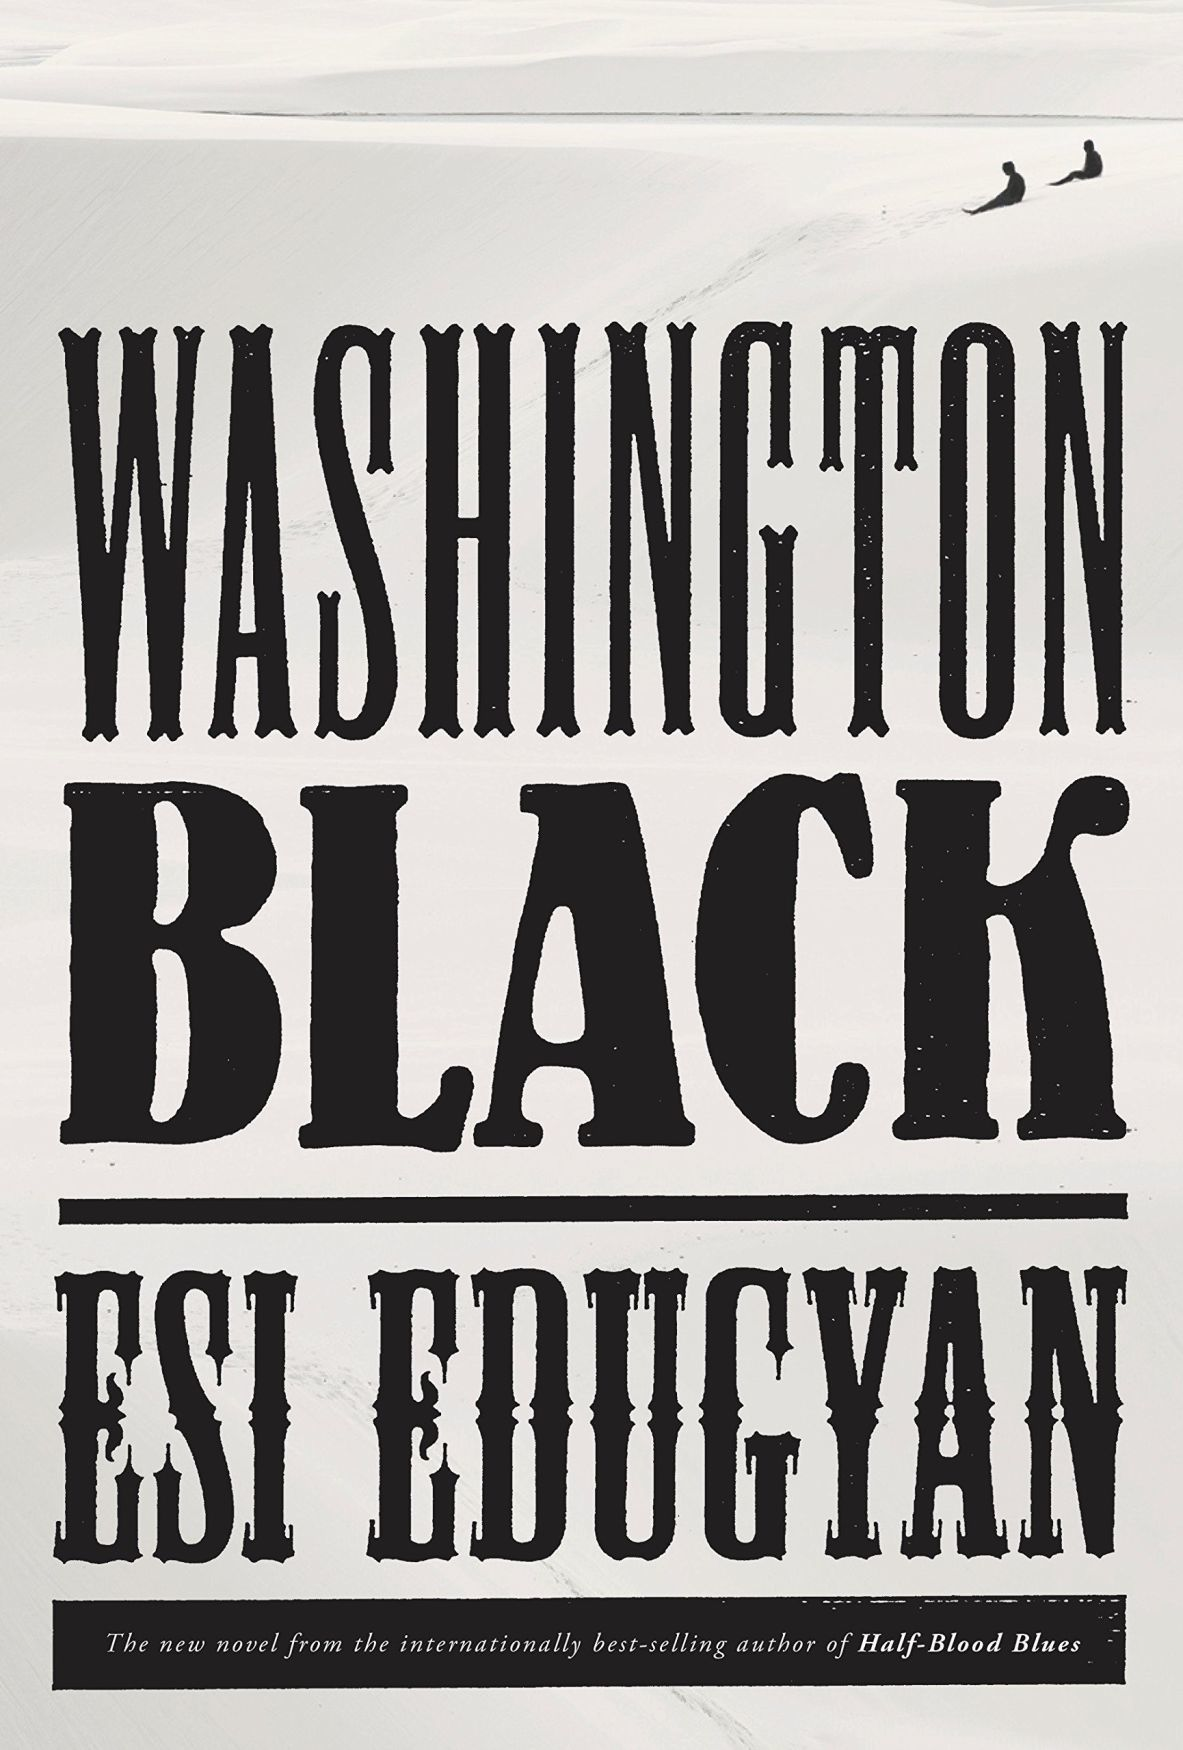 'Washington Black'